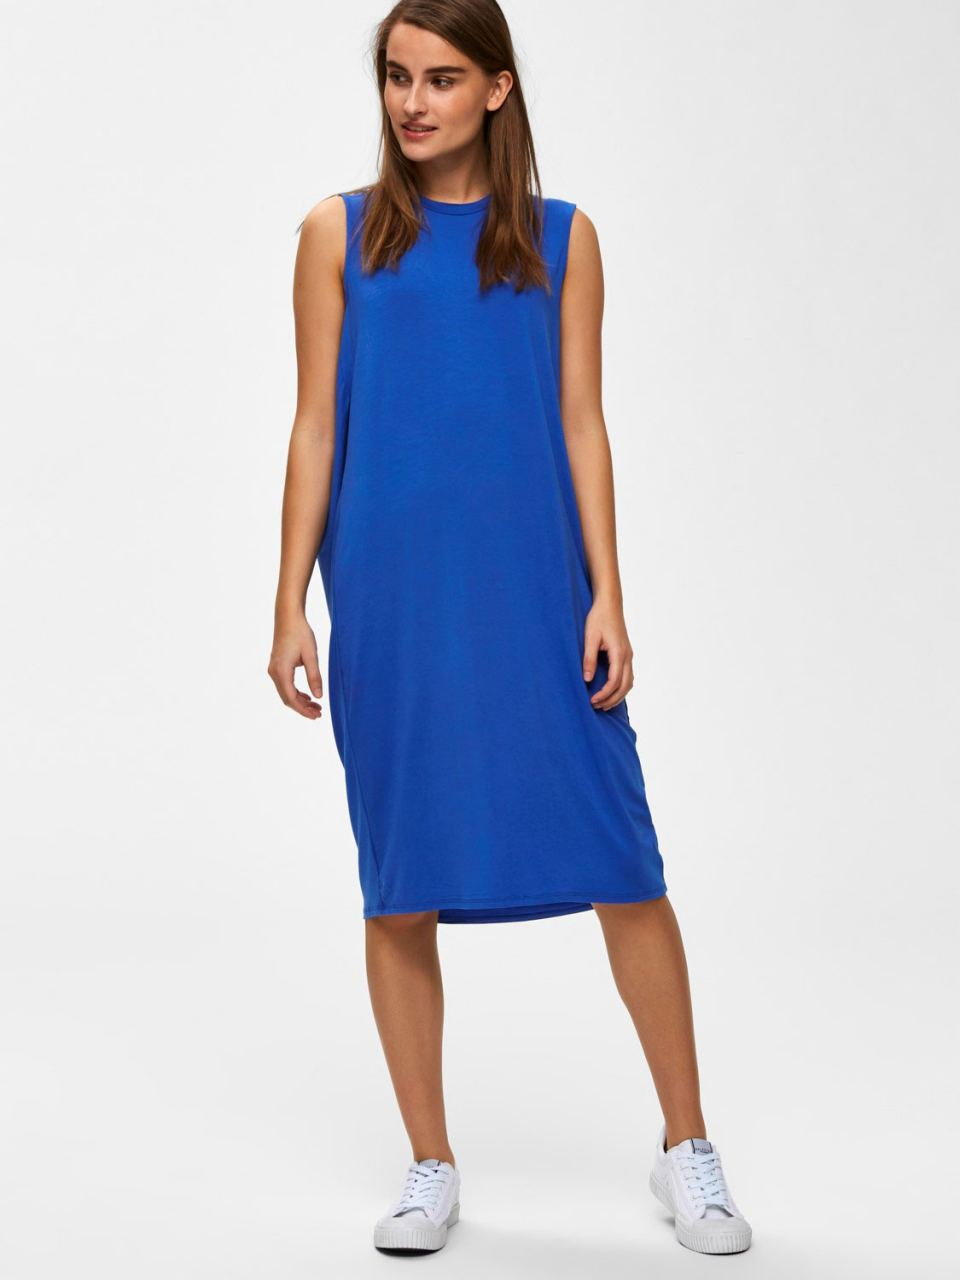 SLFAsha Kleid Dazzling Blue